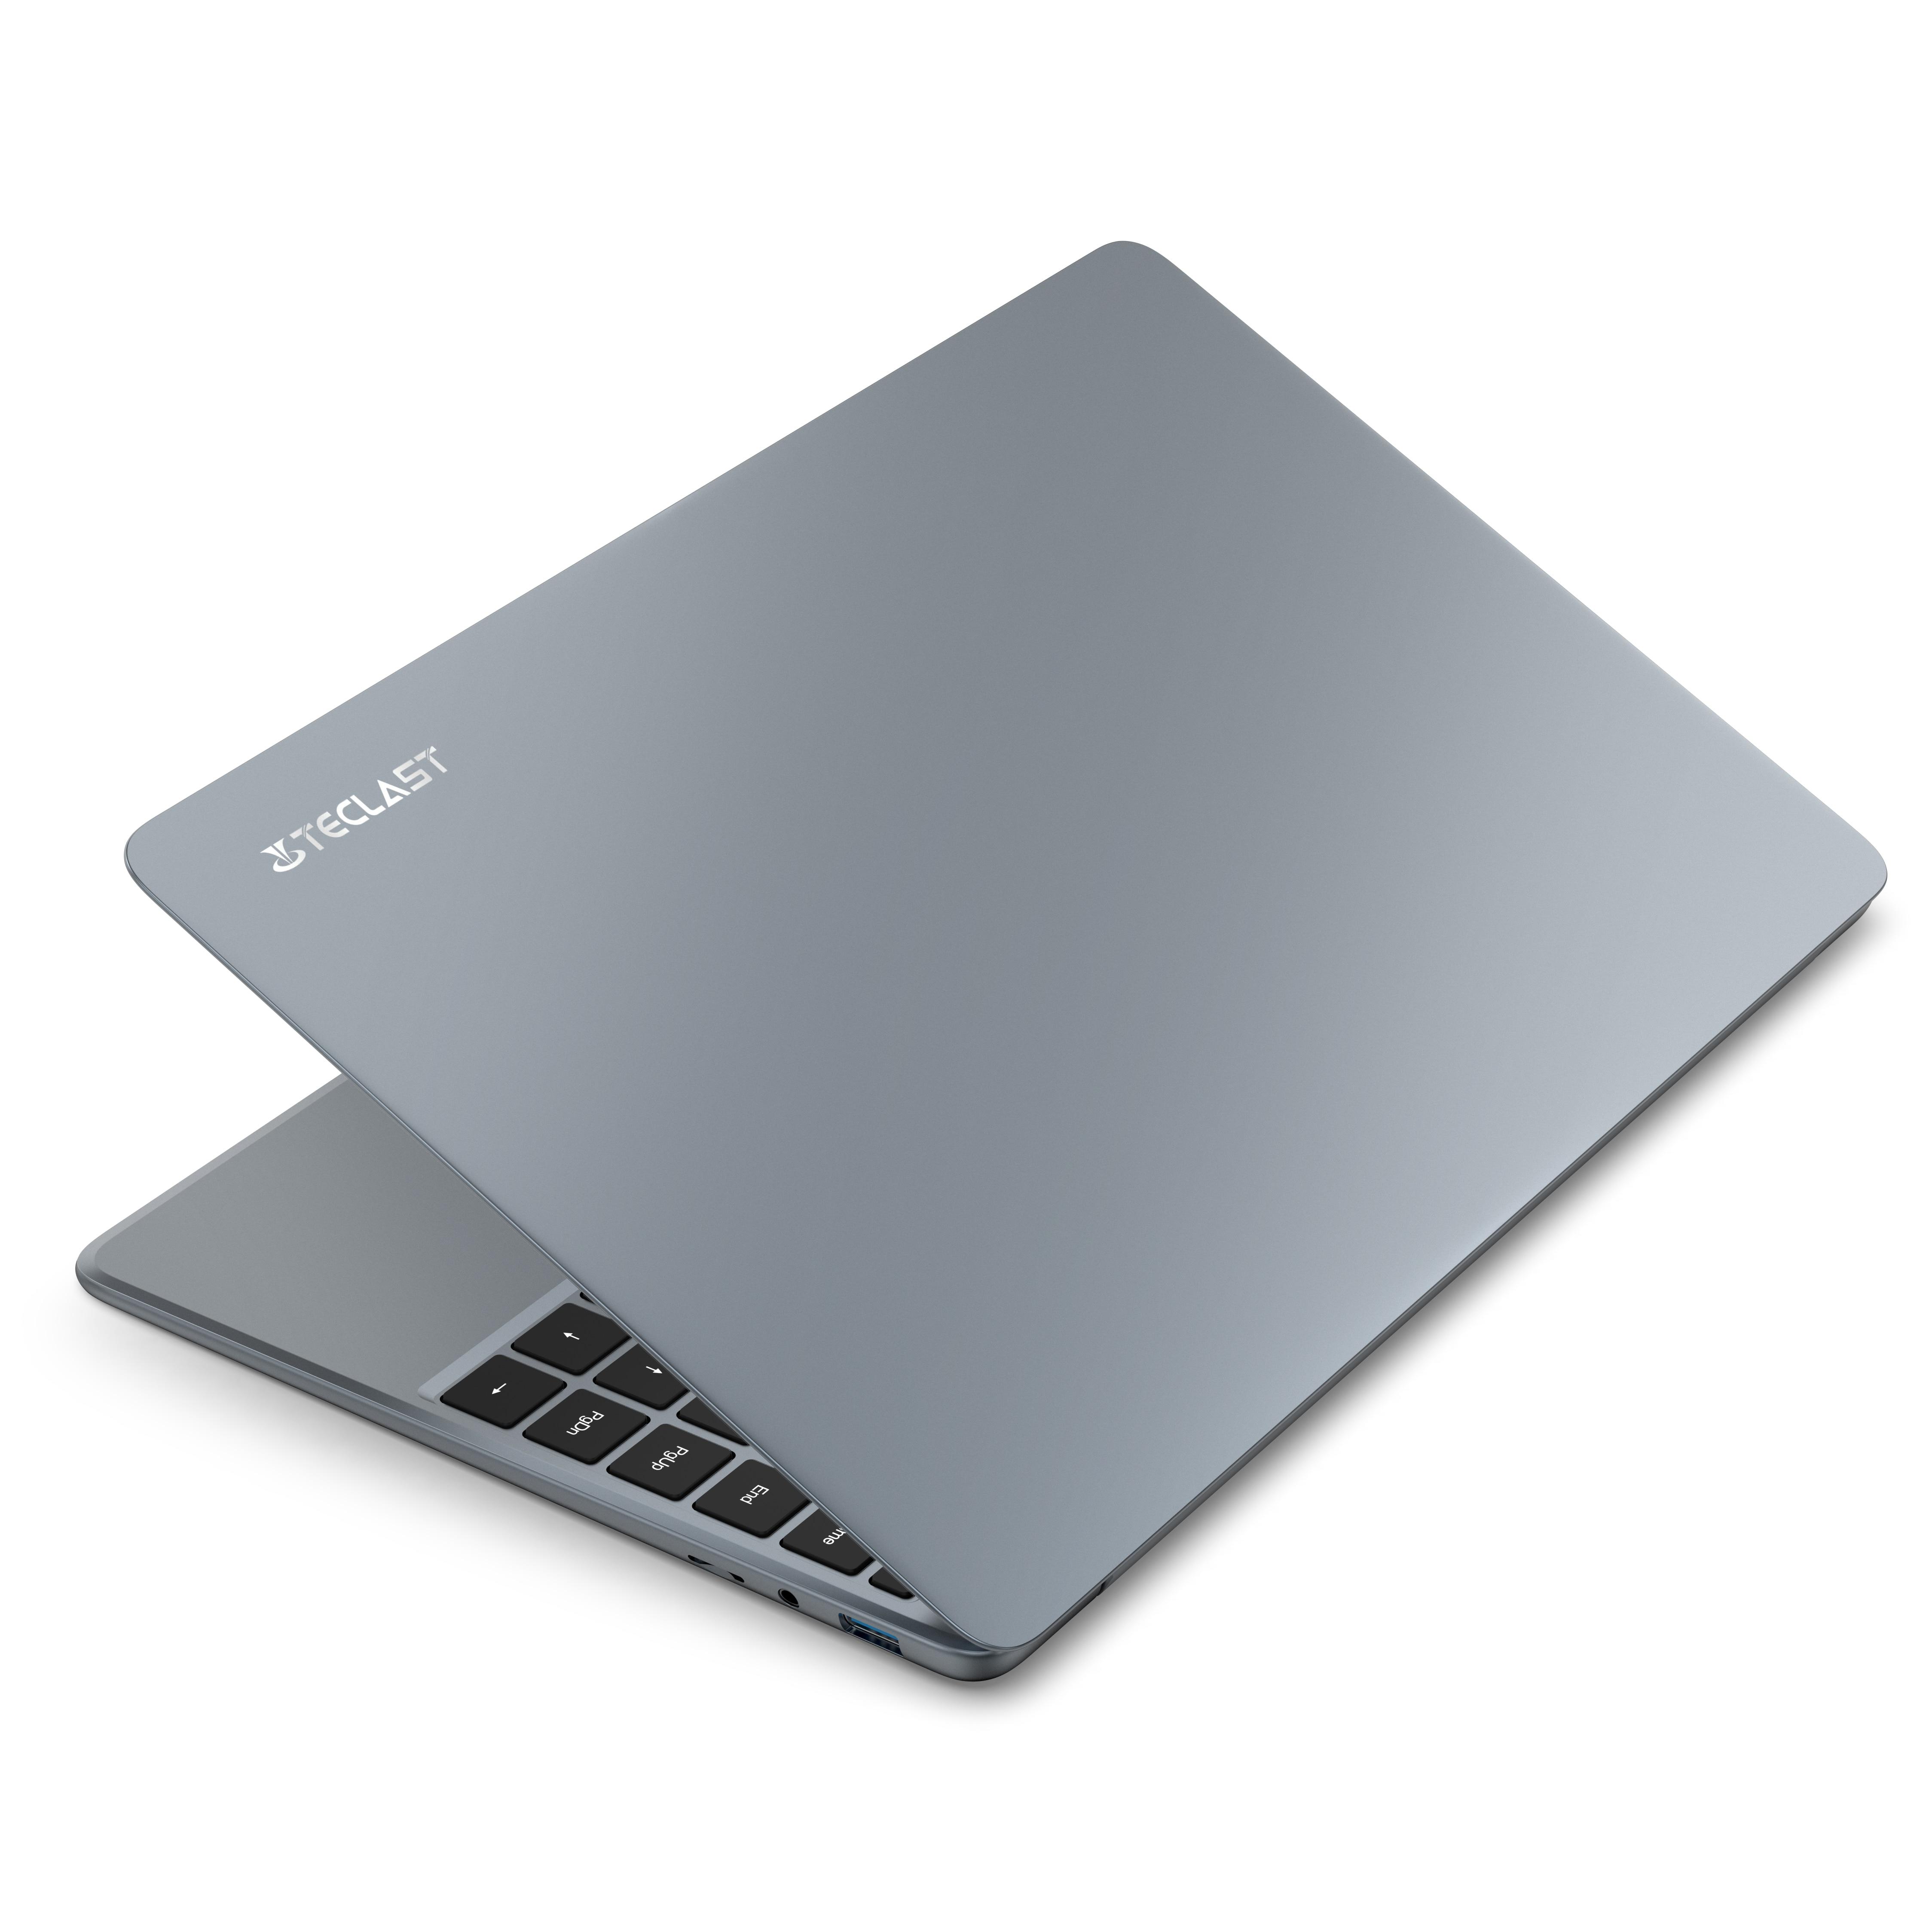 Teclast F7 Plus 2 Laptop 14.1 Inch Notebook Windows 10 1920 x 1080 Intel Gemini Lake N4120   Keyboard Notebook